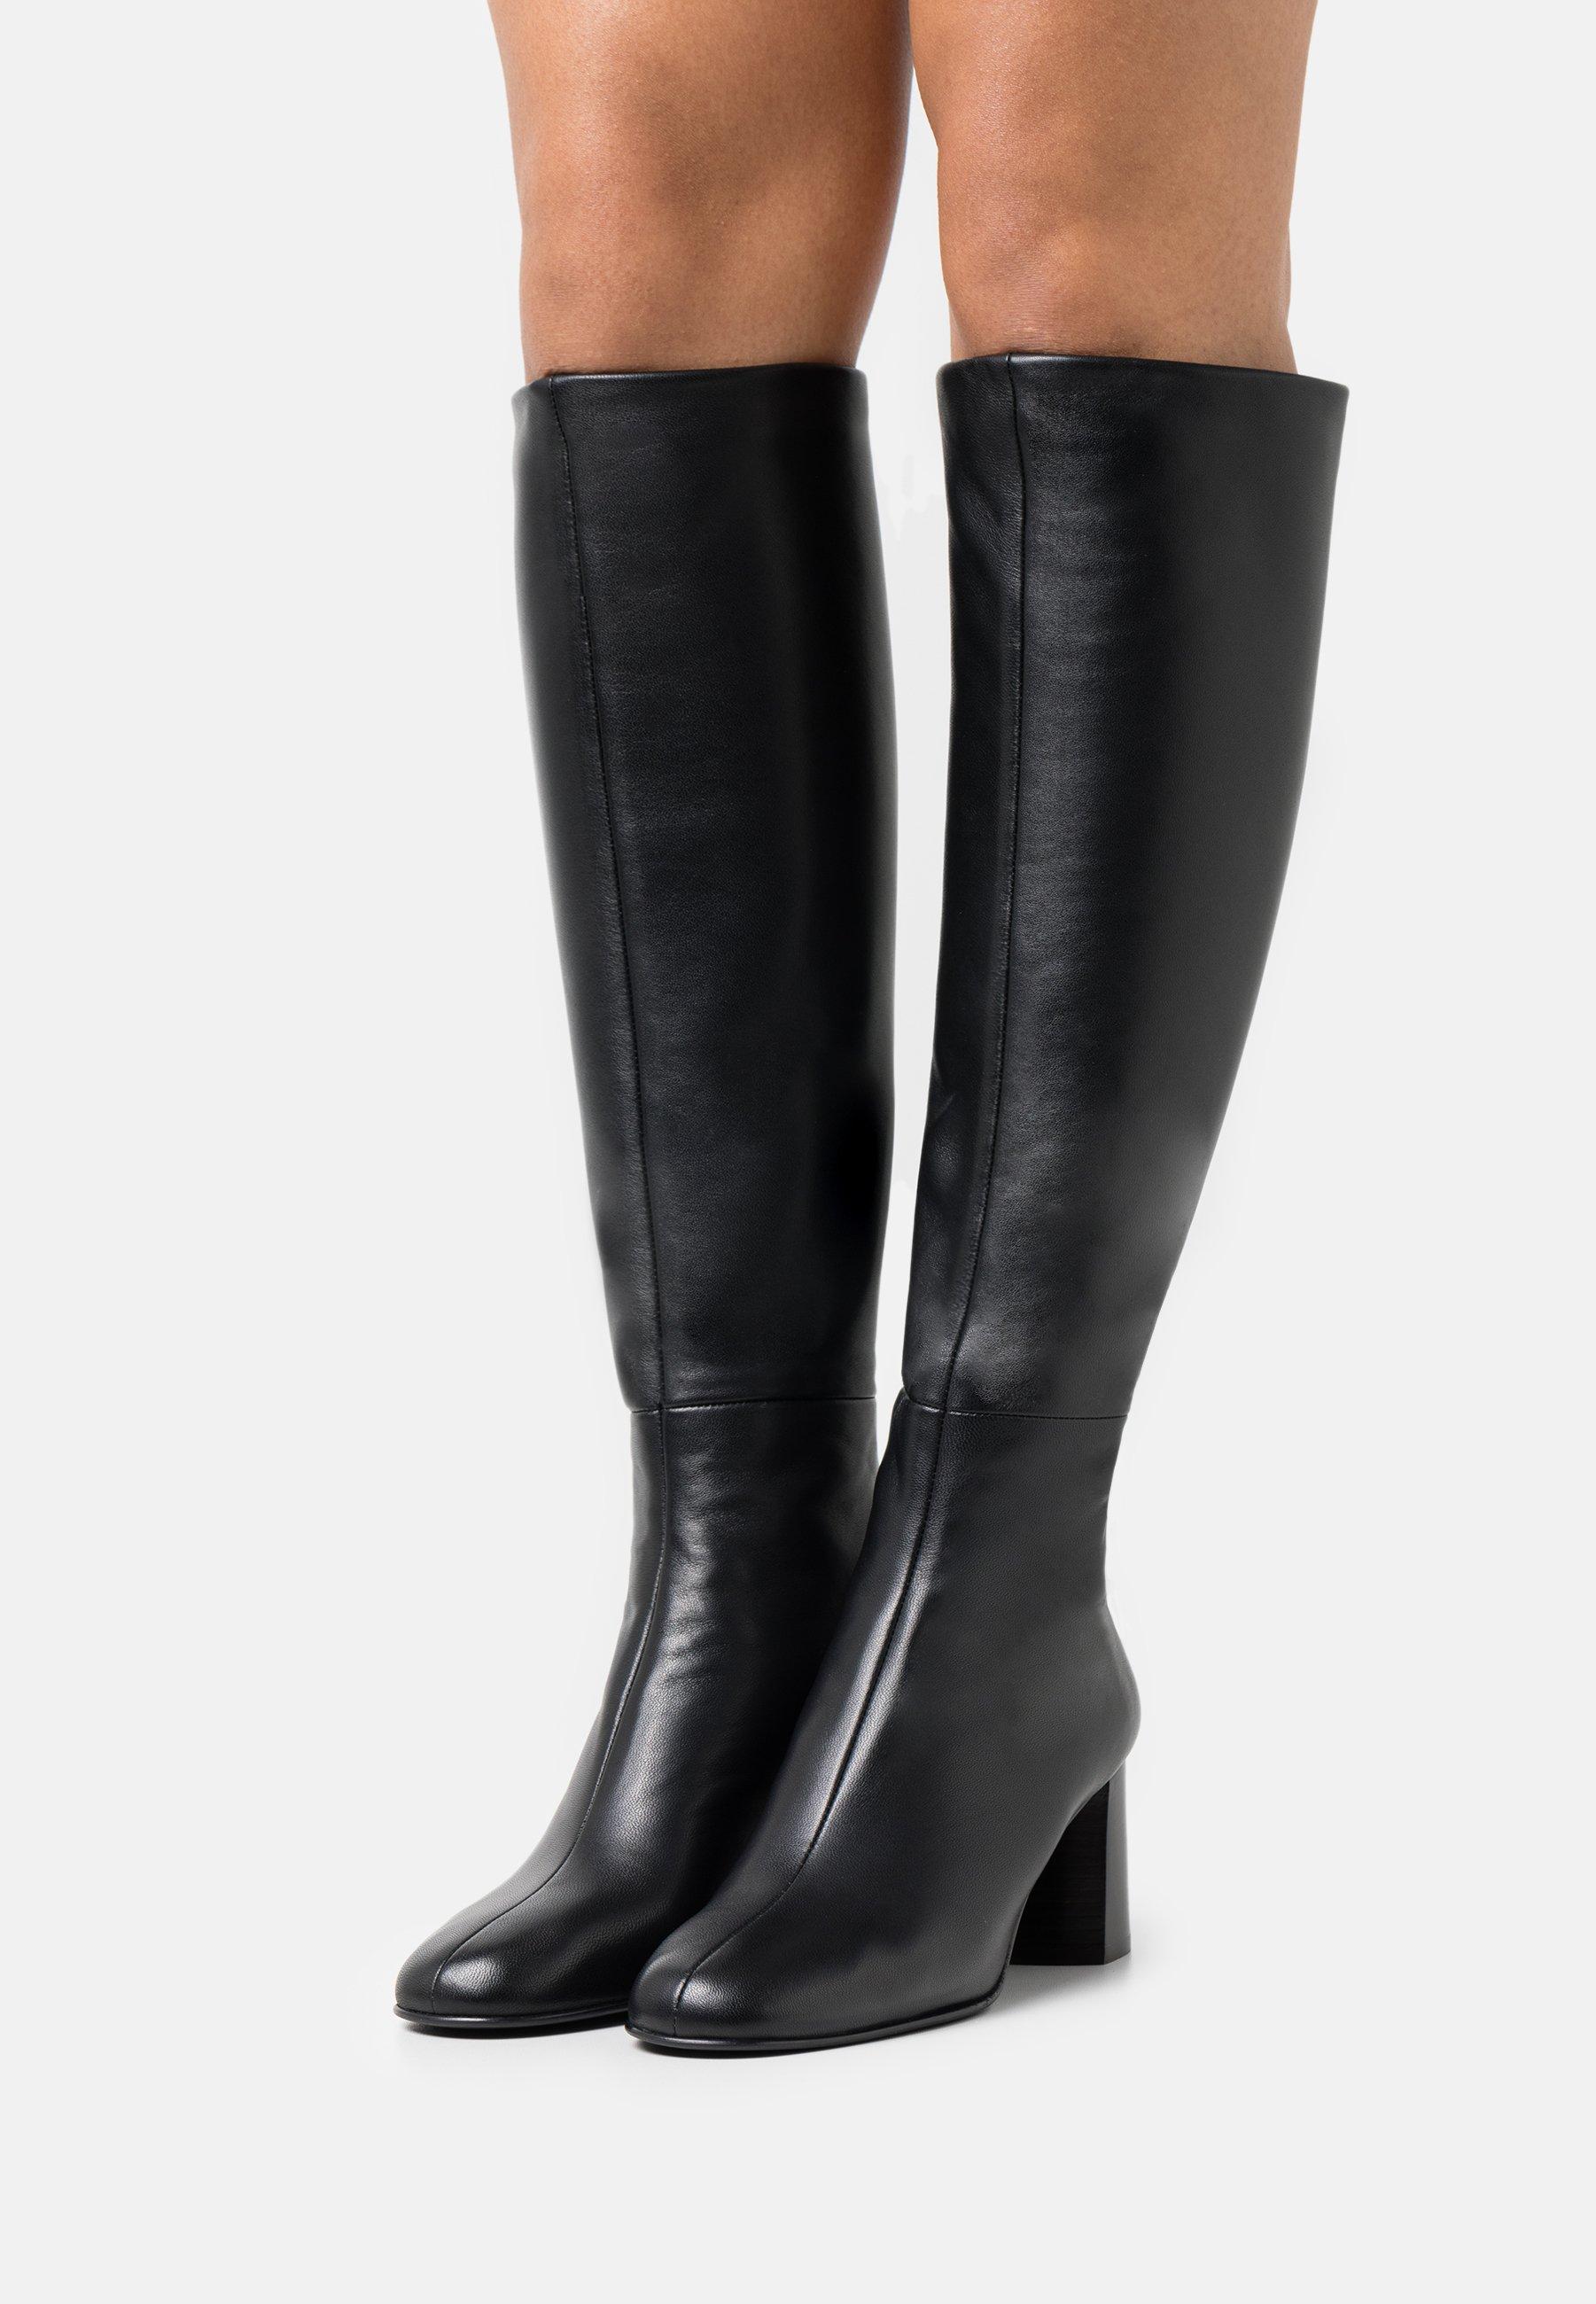 Femme NADIA SOFT TALL HEEL BOOT - Bottes